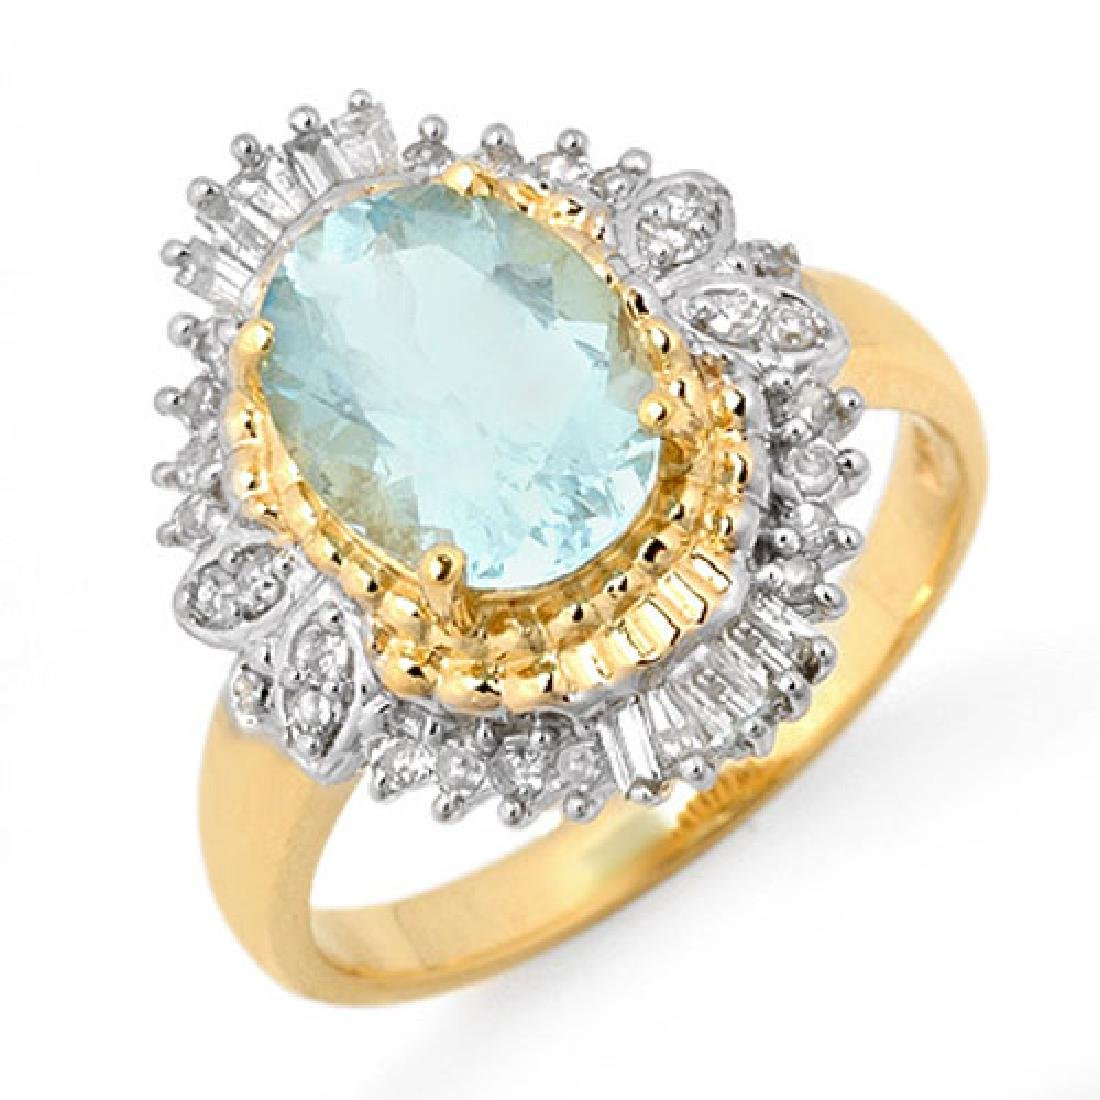 2.48 CTW Aquamarine & Diamond Ring 14K Yellow Gold